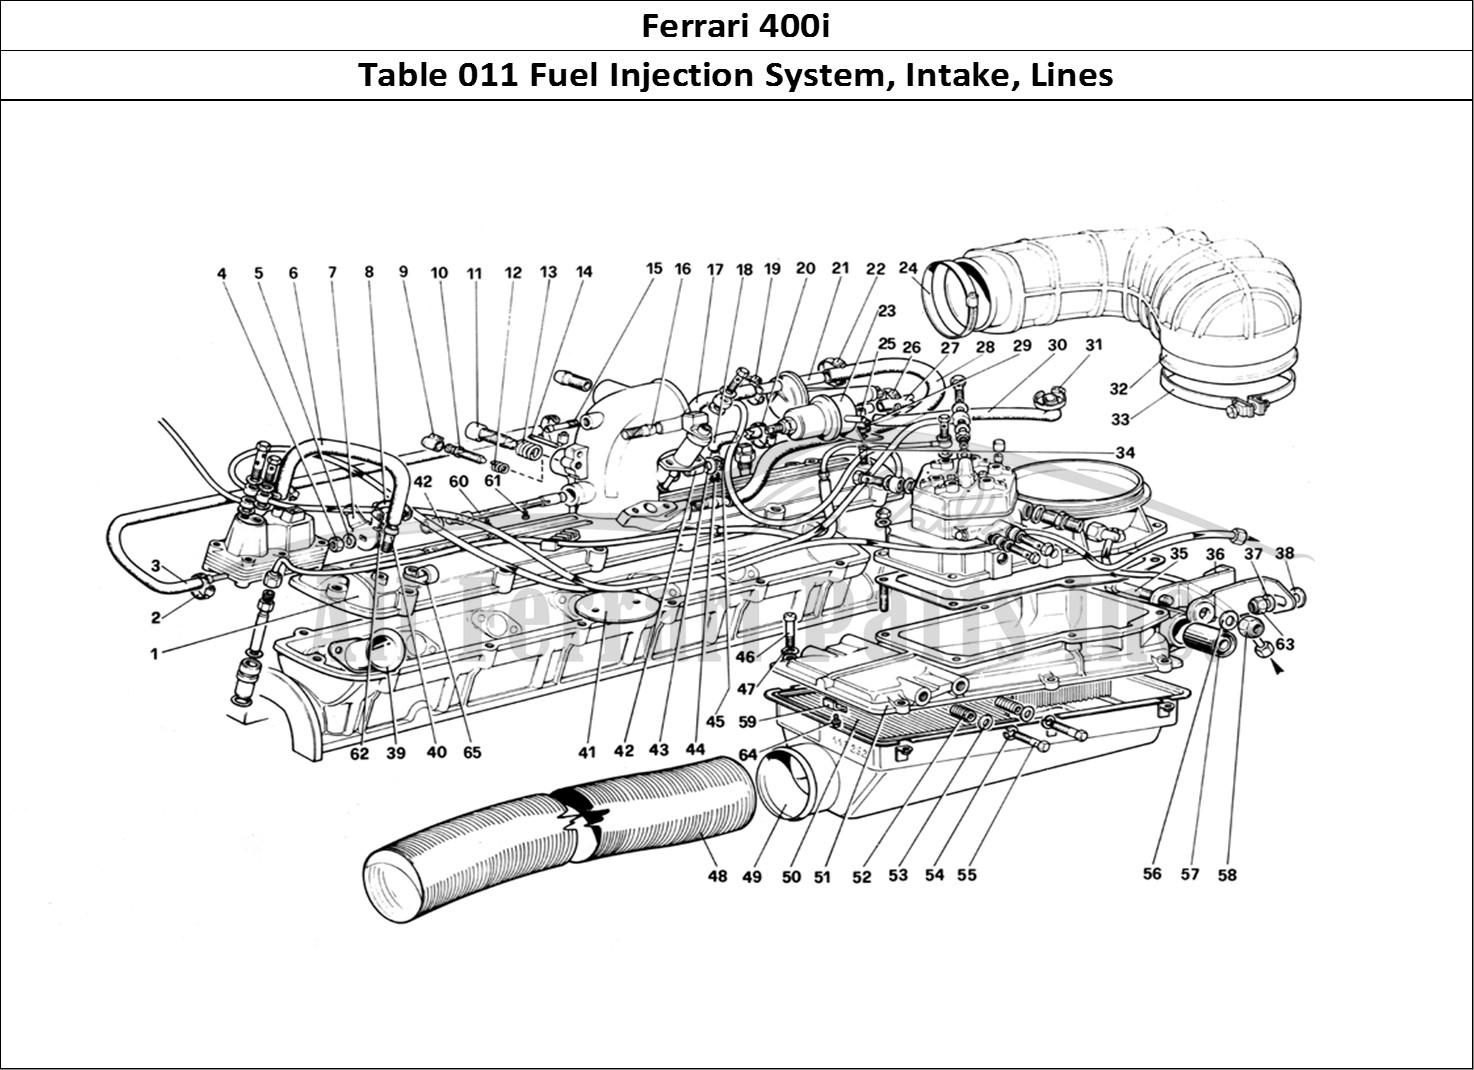 Buy Original Ferrari 400i 011 Fuel Injection System Intake Lines Diagram Mechanical Table